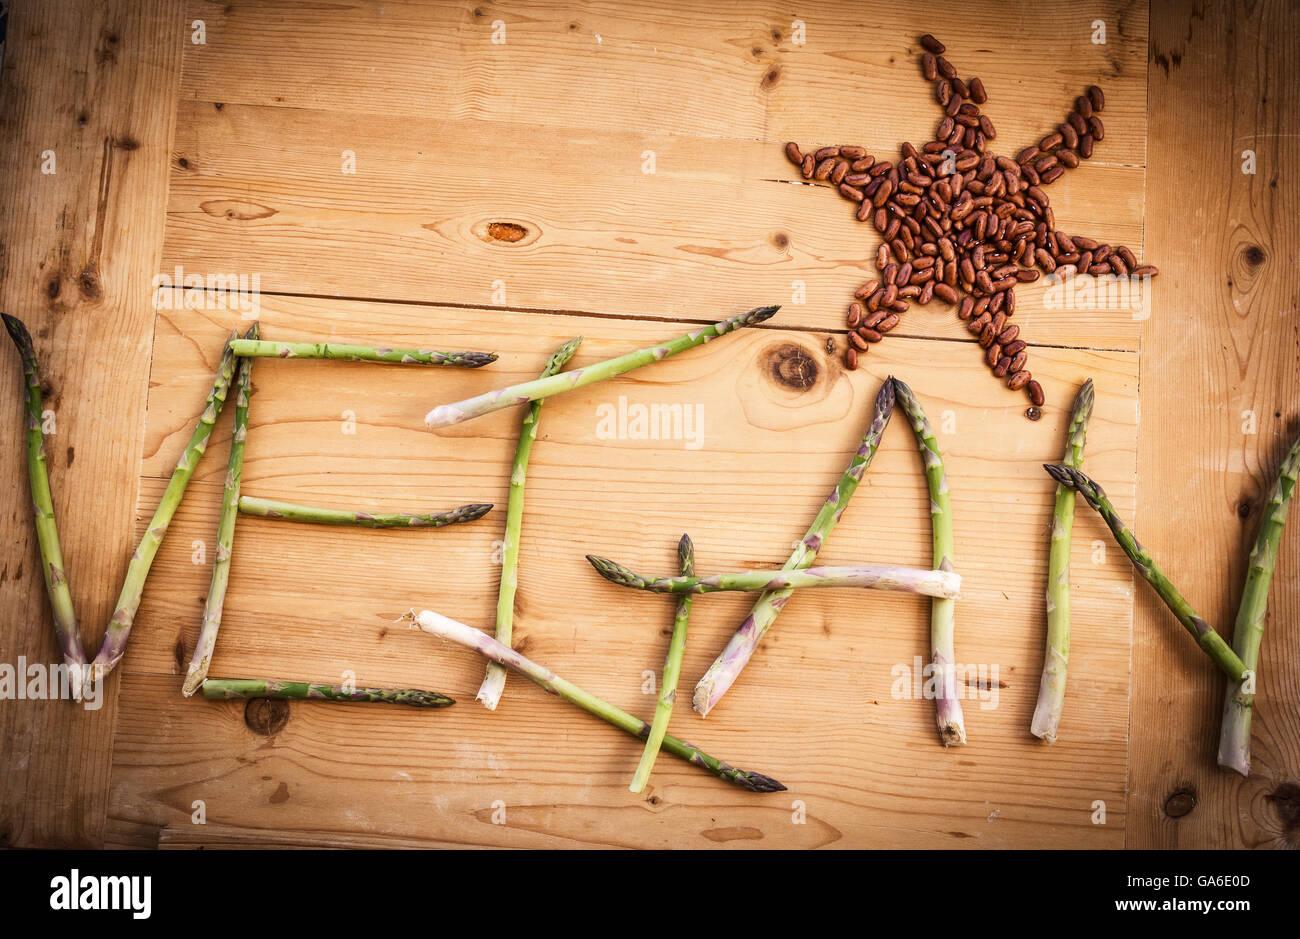 vegan style,life style - Stock Image